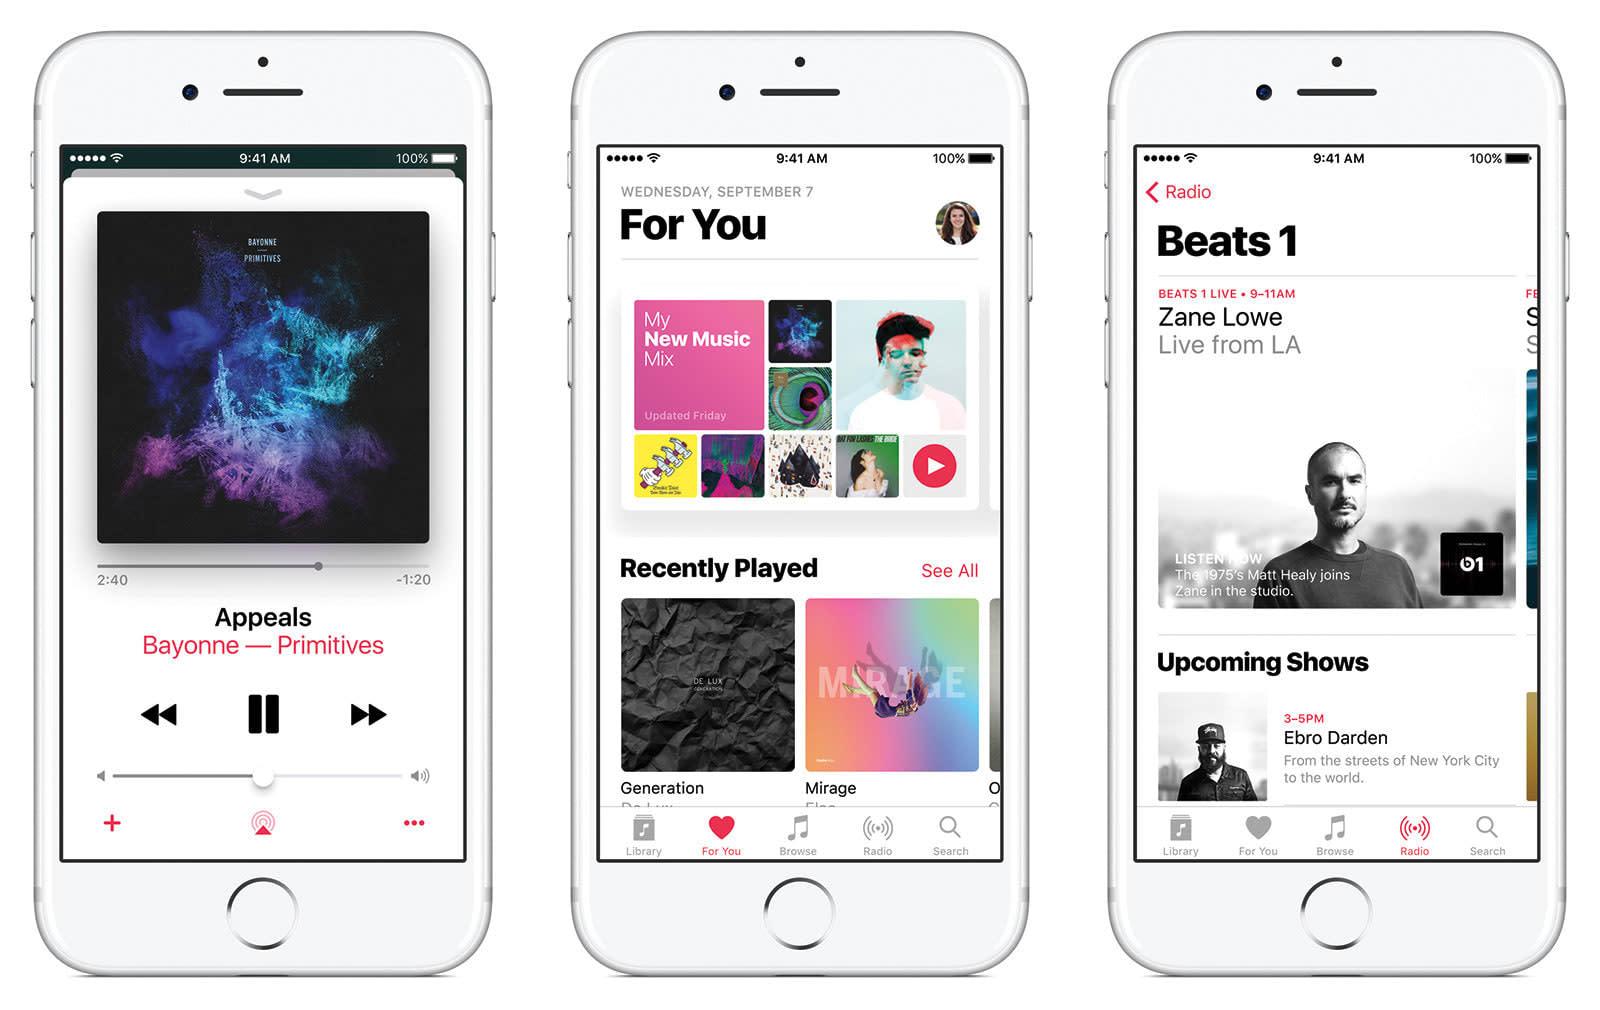 Apple's $3 billion purchase of Beats has already paid off